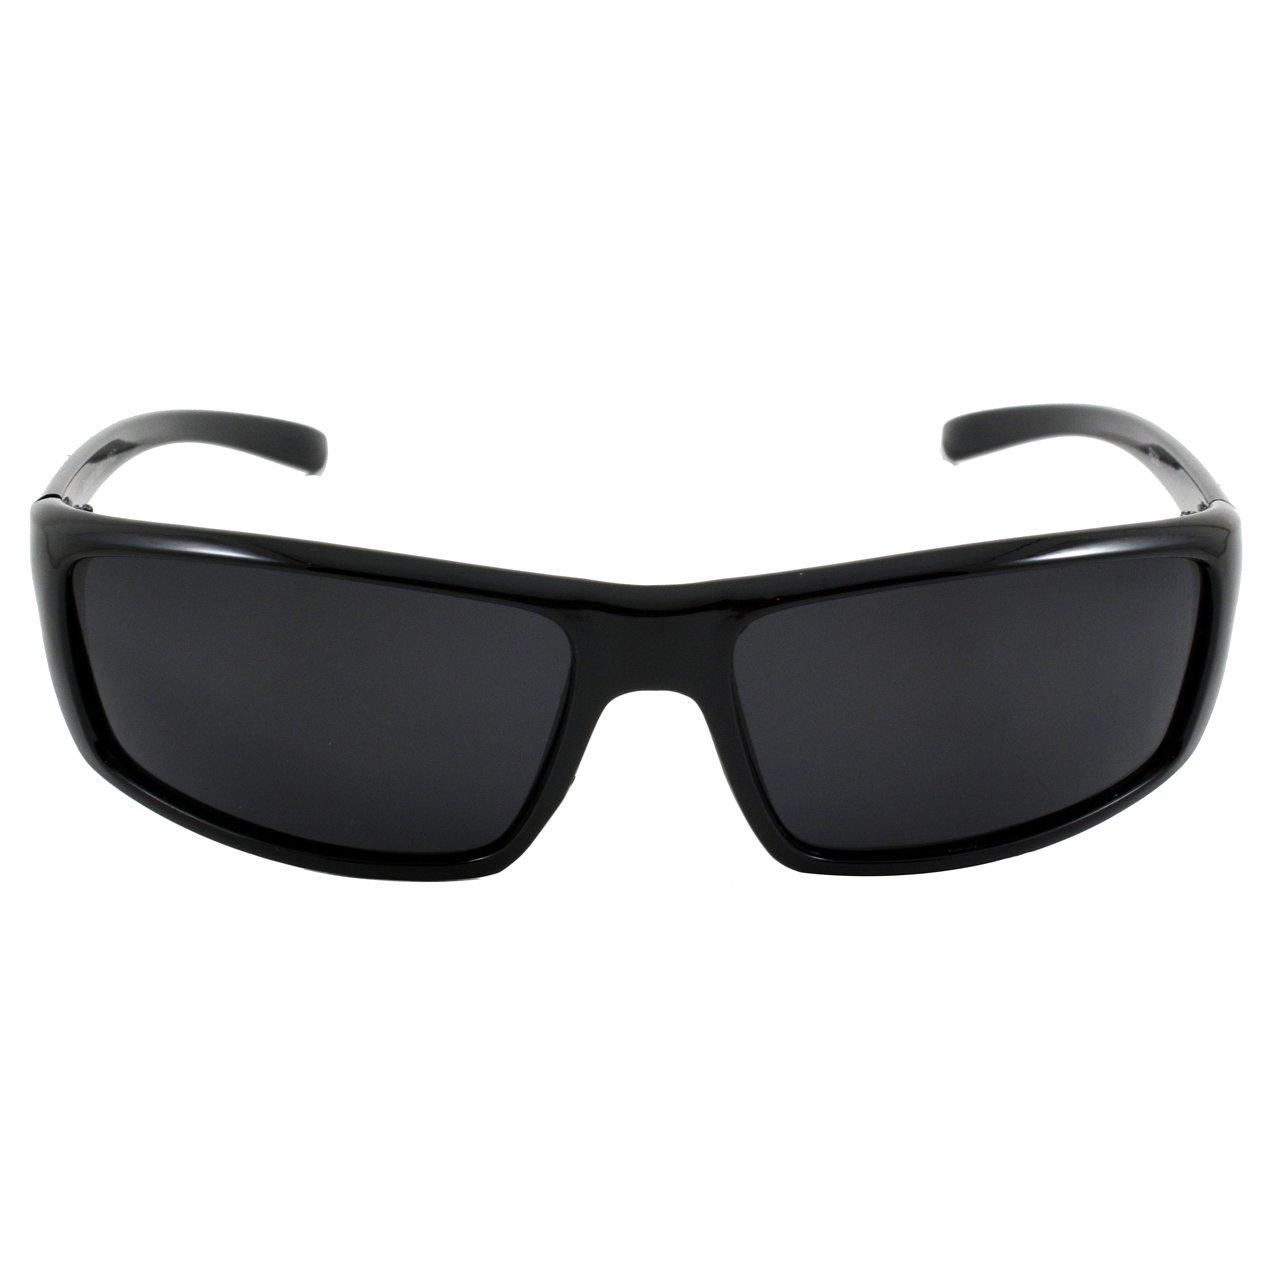 عینک آفتابی  الدرادو مدل Slim Black Series